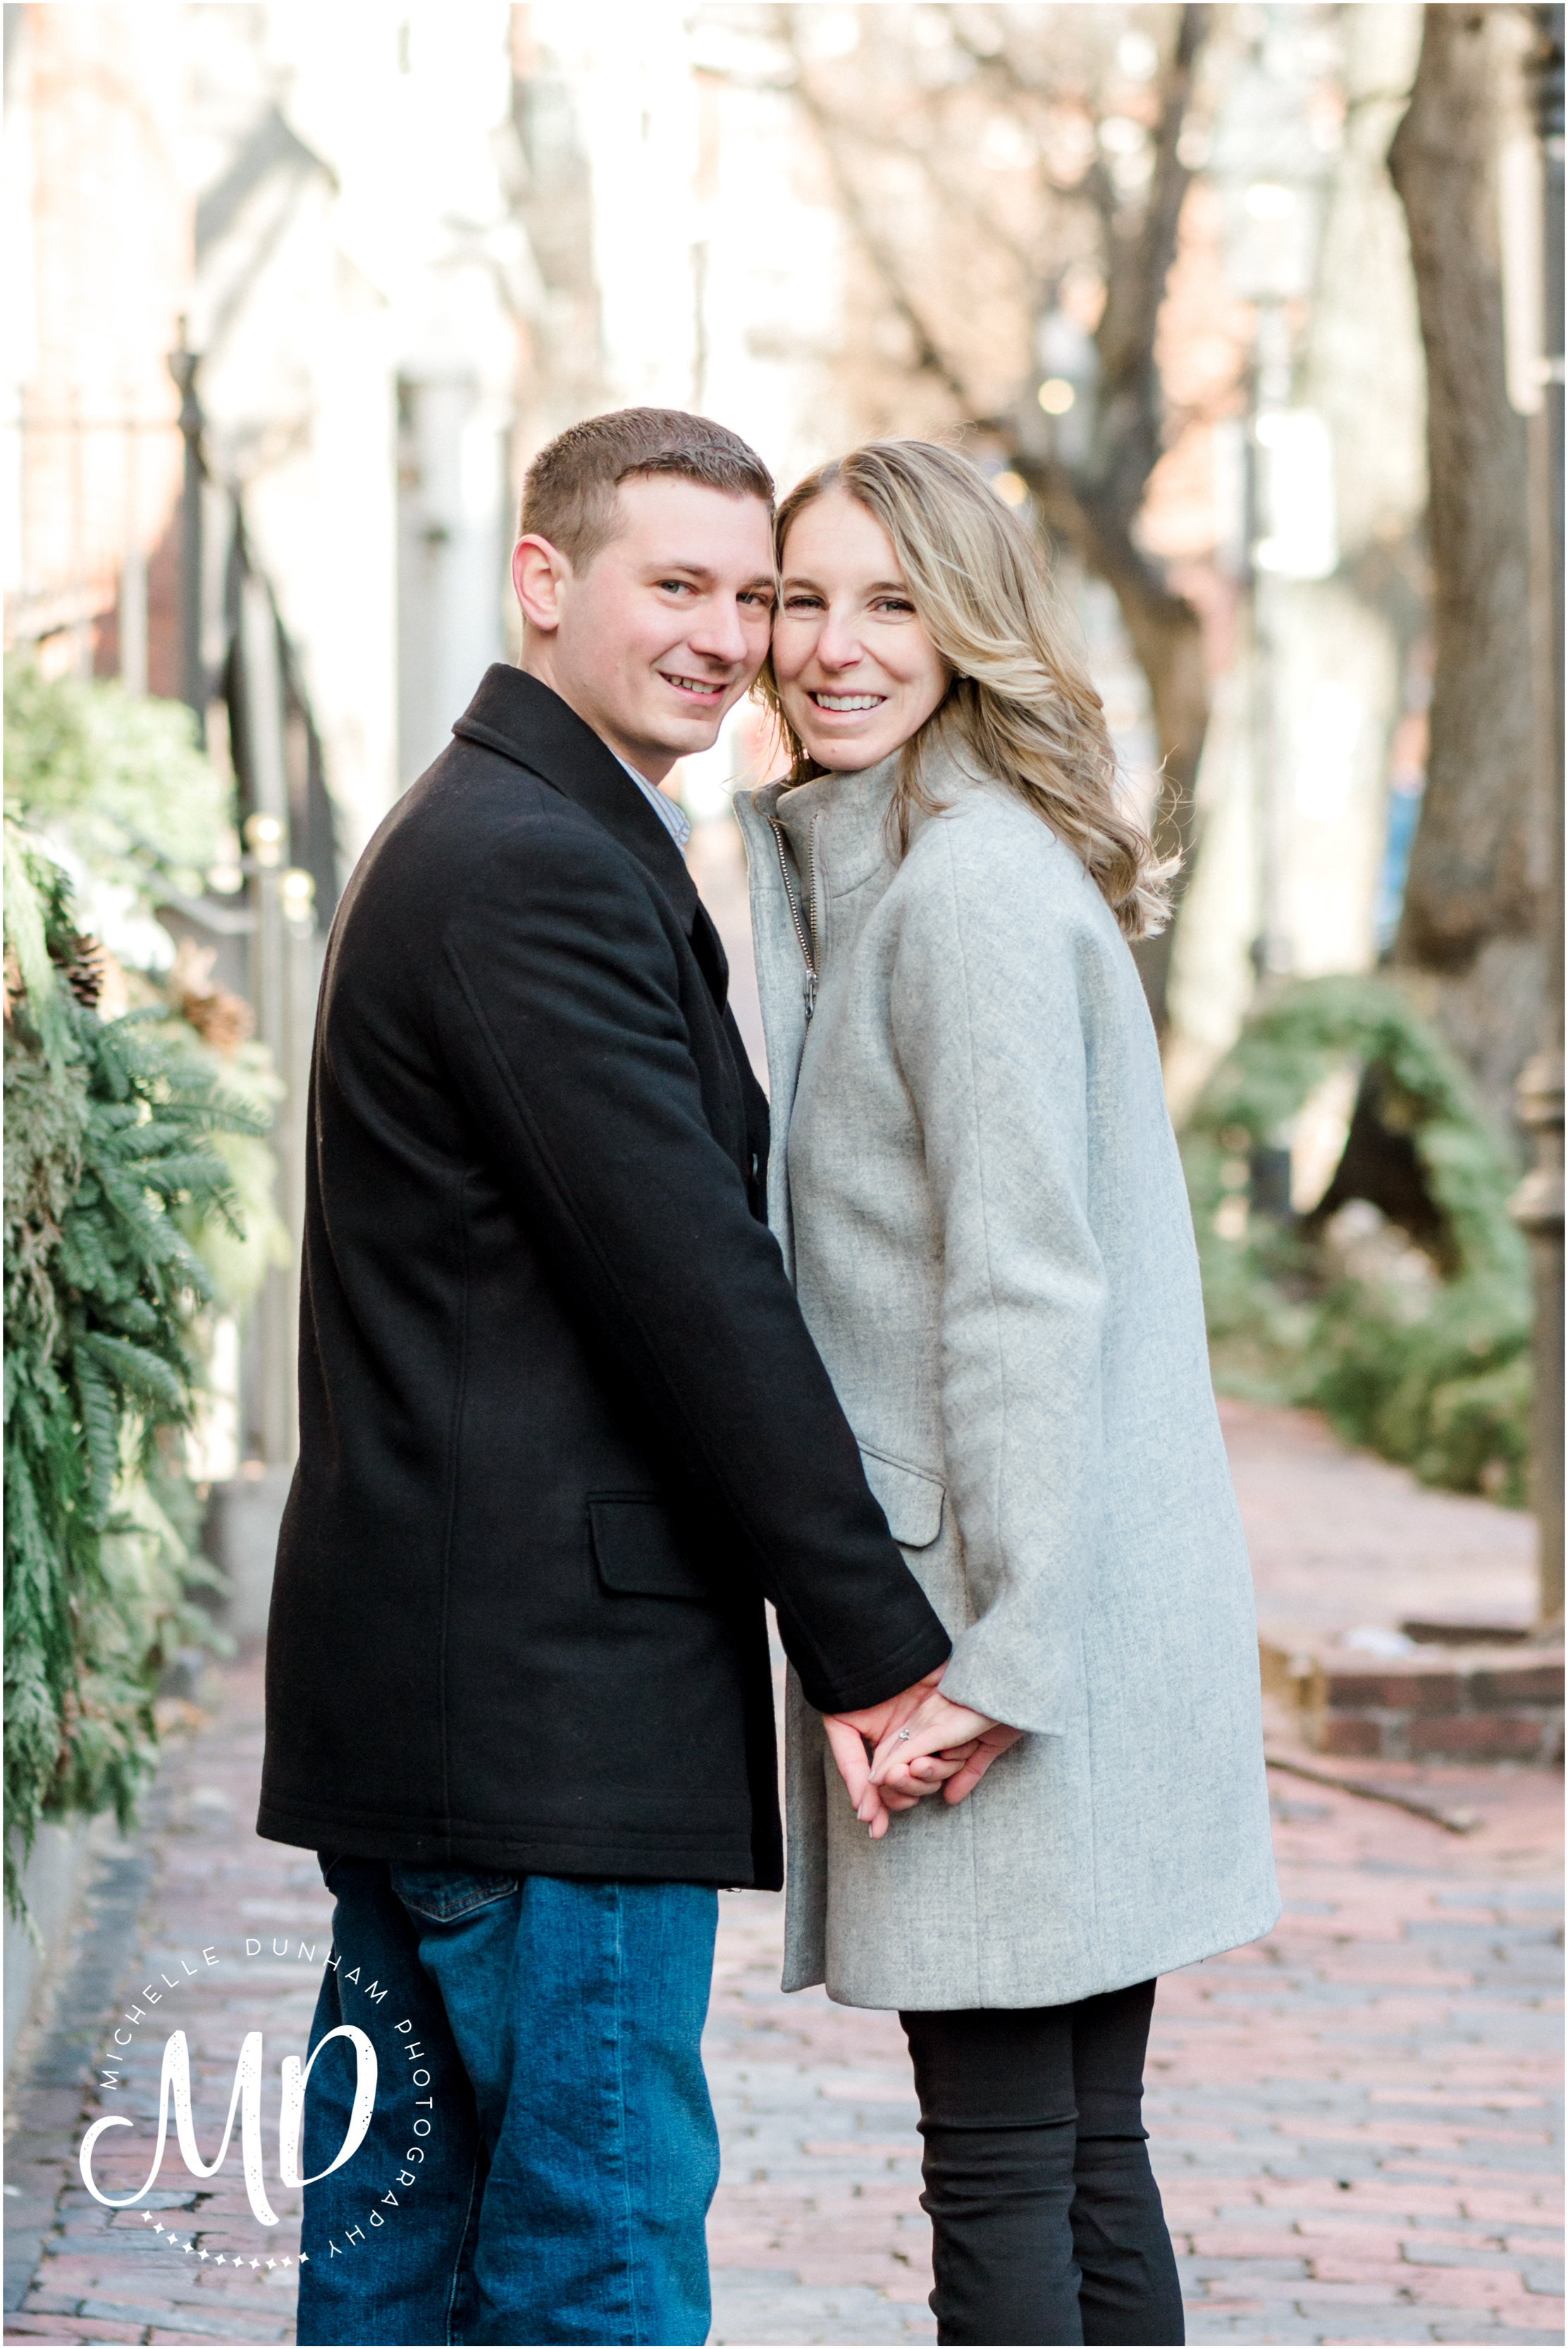 Michelle-Dunham-Photography-Beacon-Hill-Engagement-25.jpg